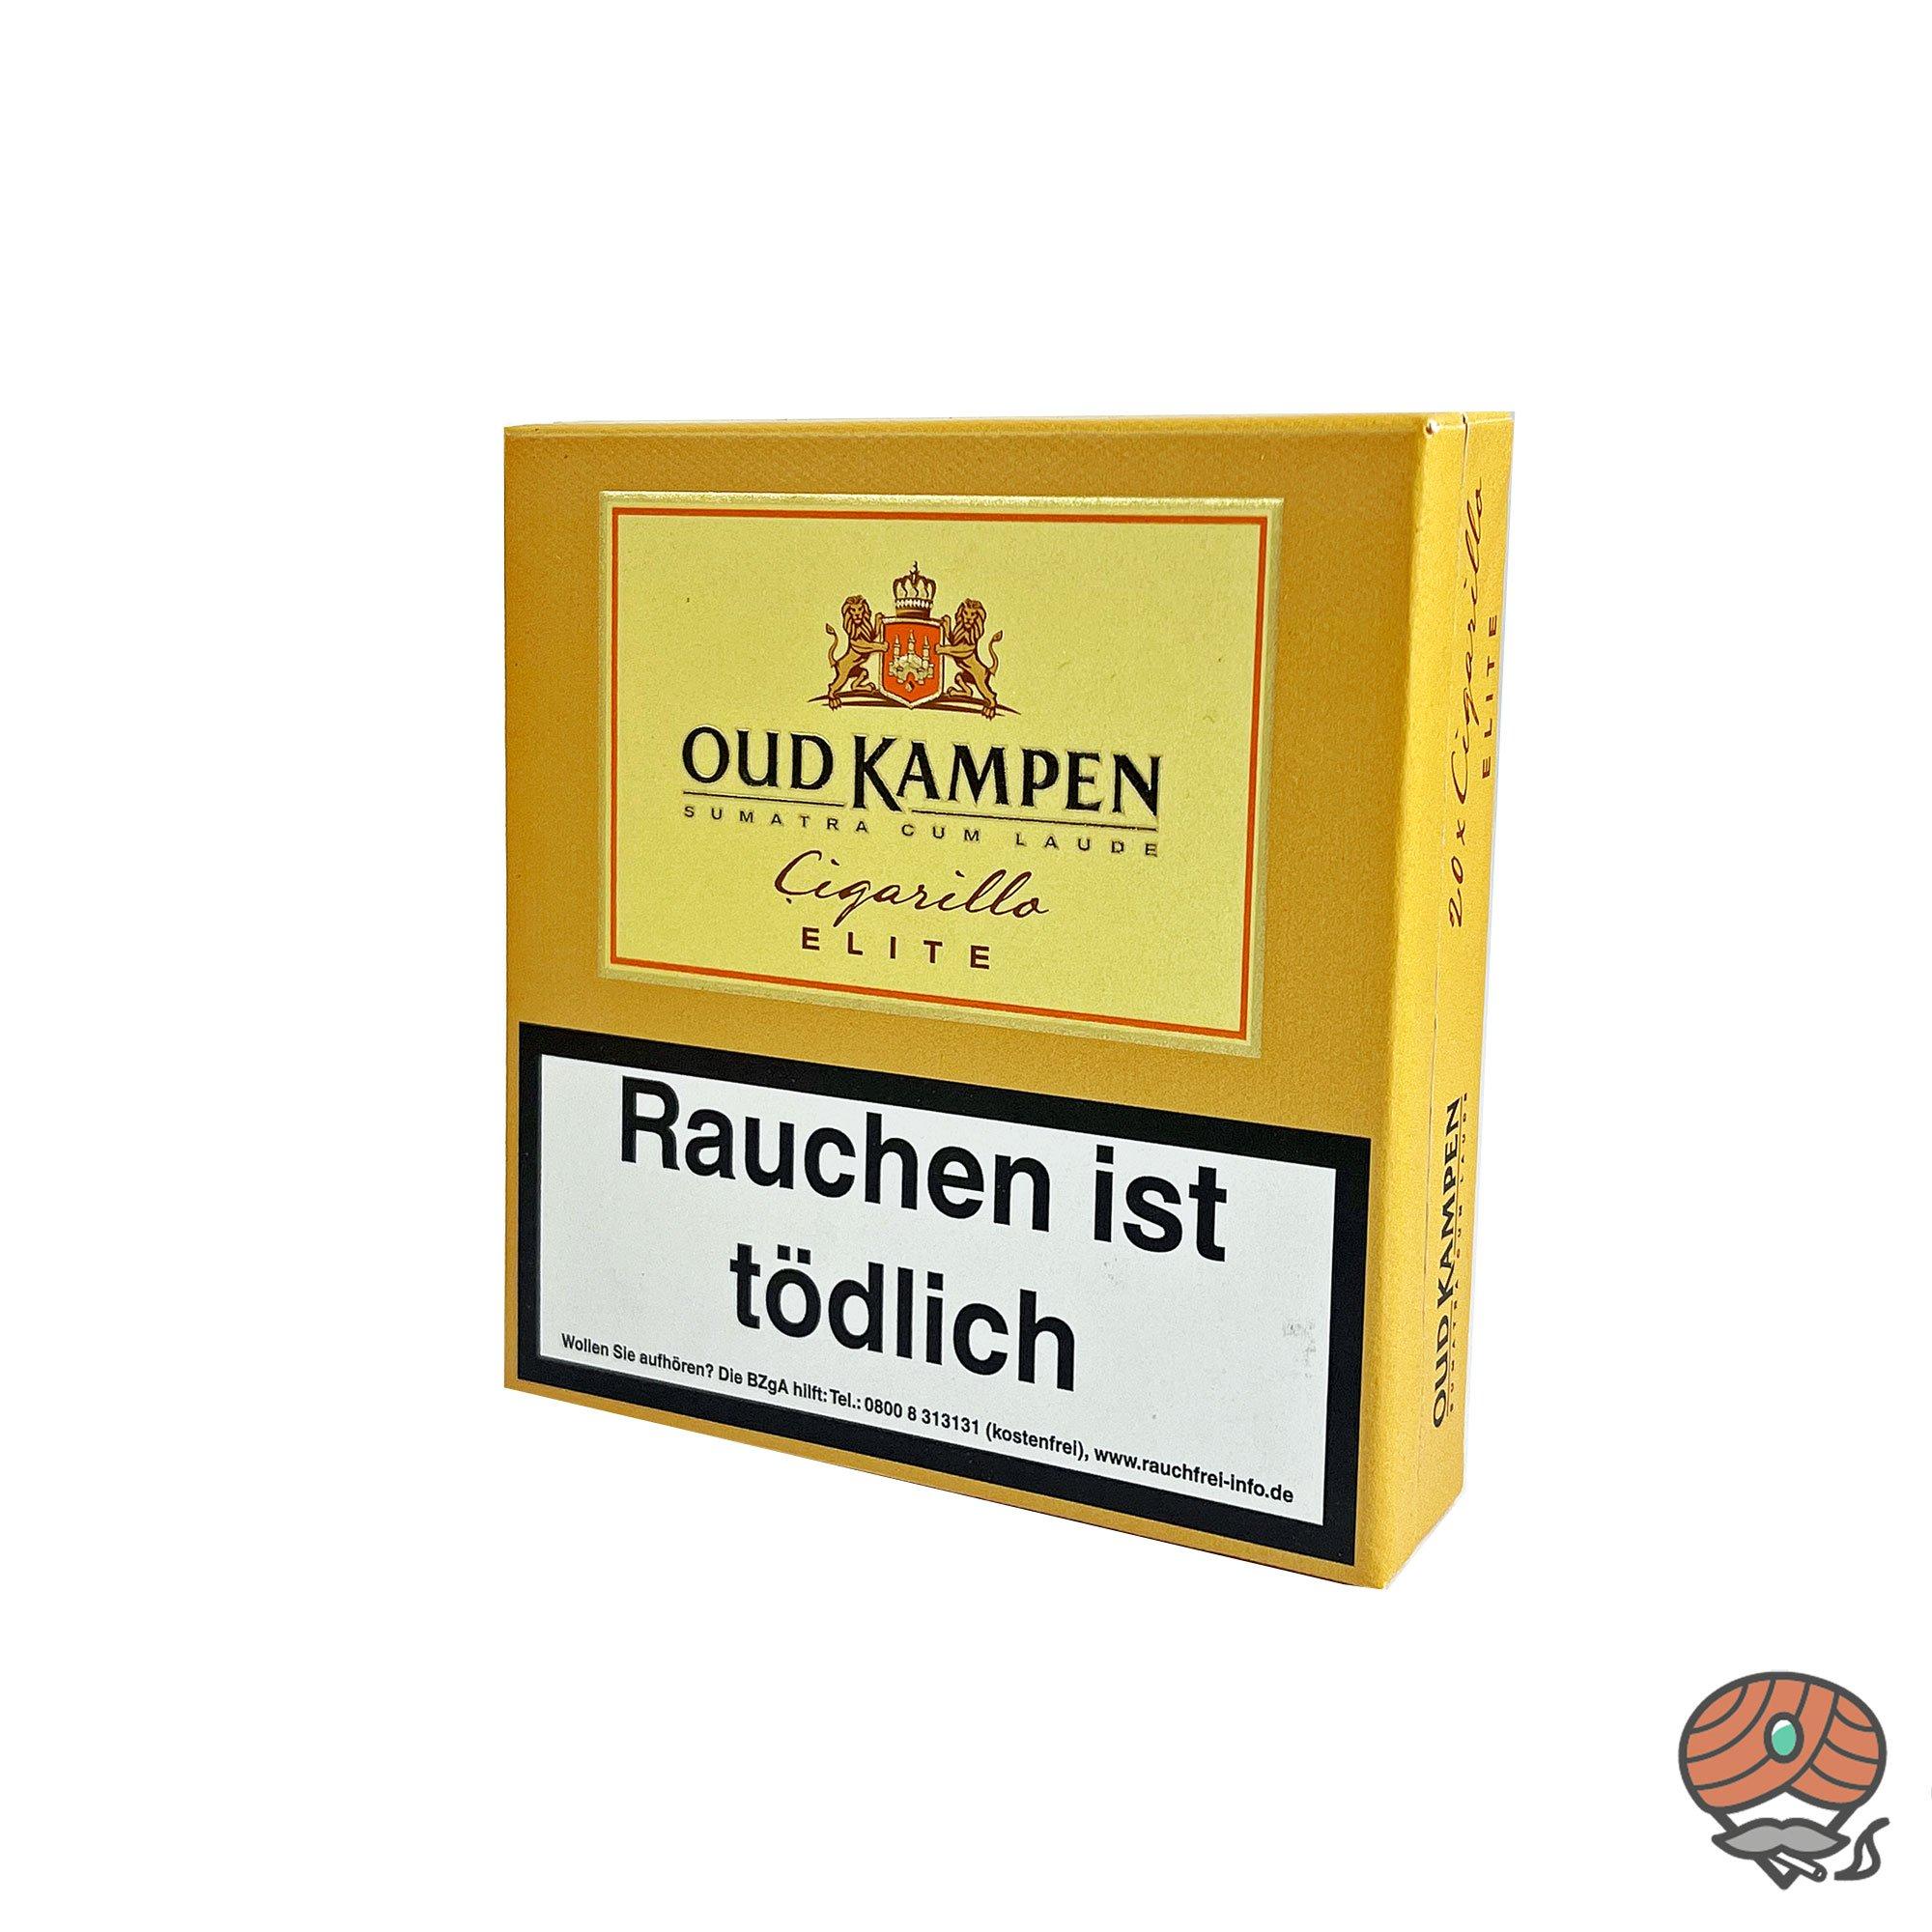 Oud Kampen Elite Zigarillos Sumatra Cum Laude 100% Tabak